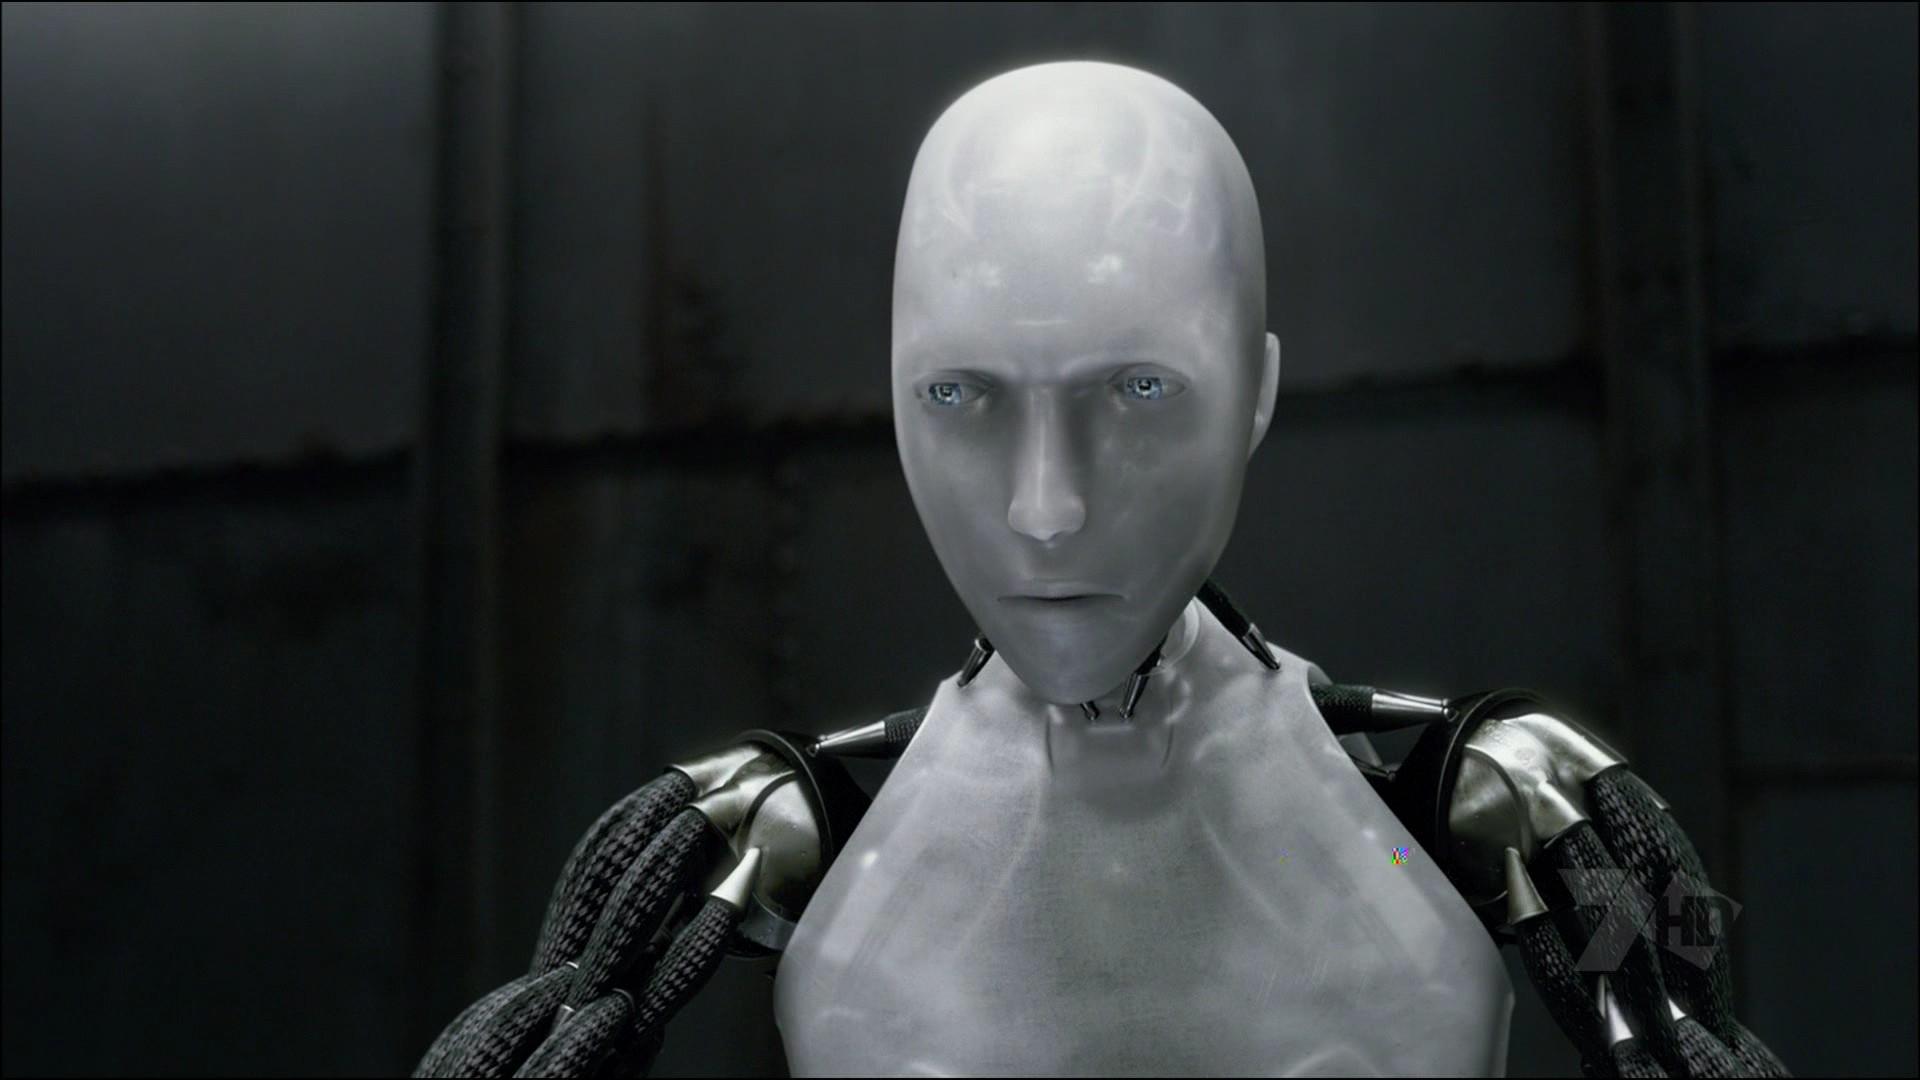 I, Robot Backgrounds, Compatible - PC, Mobile, Gadgets| 1920x1080 px